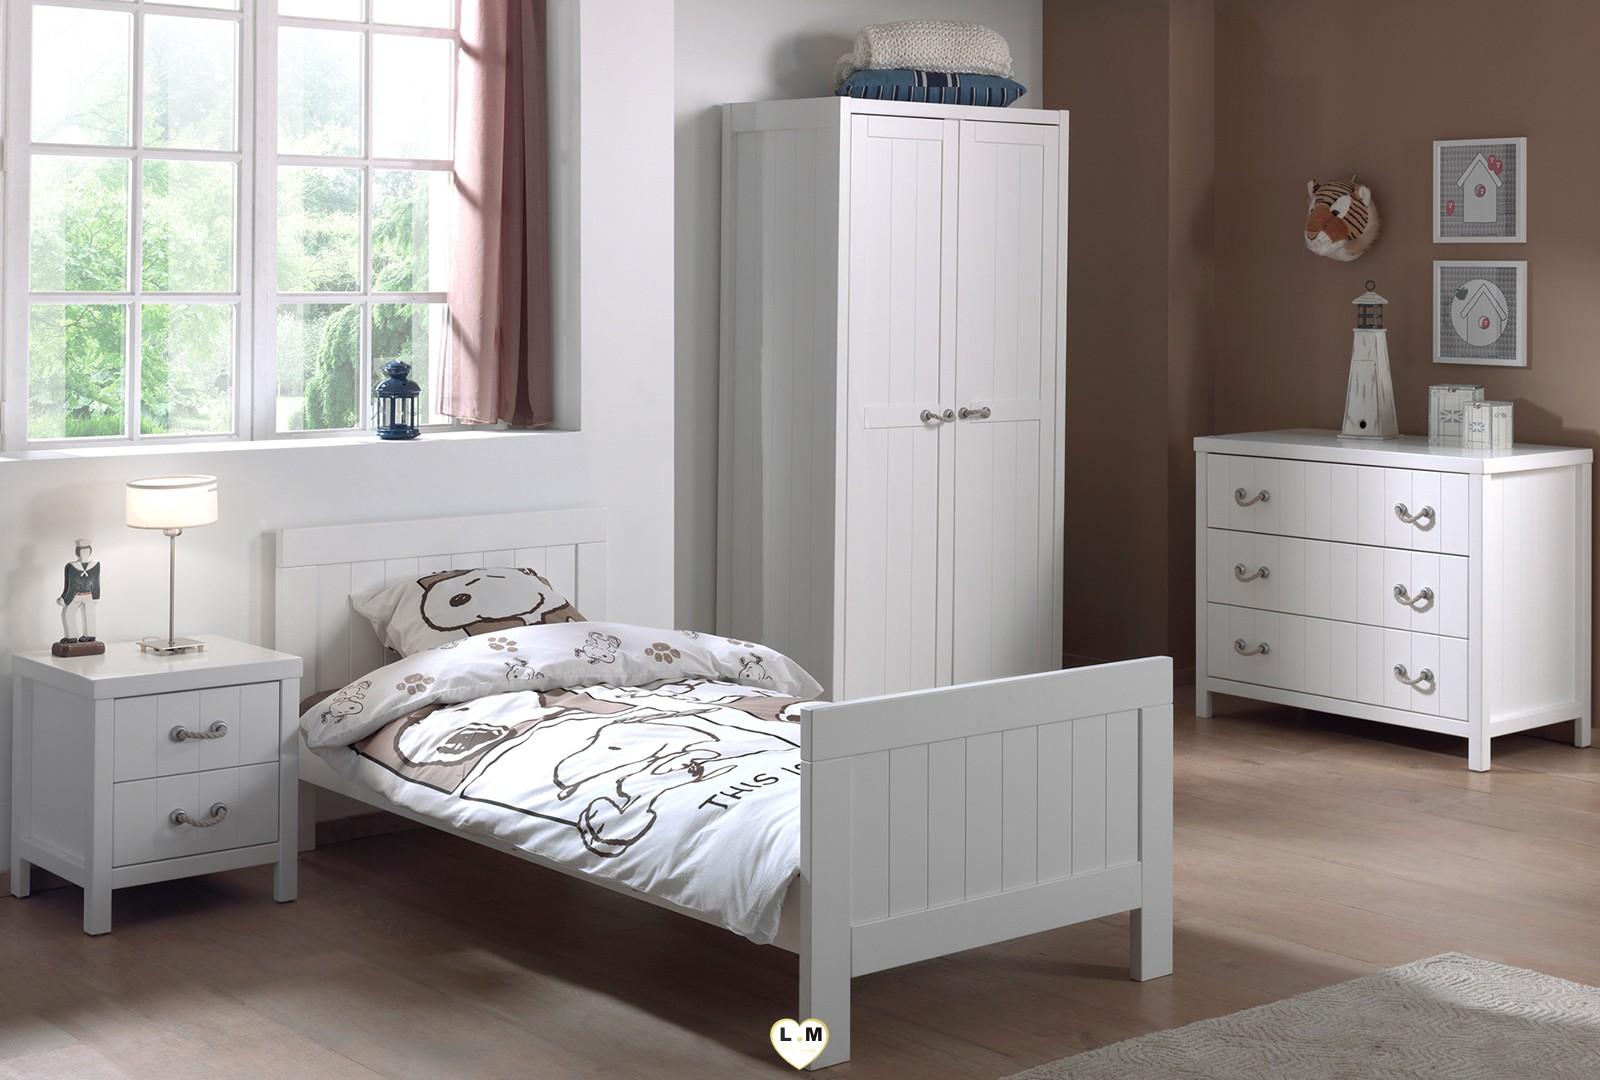 nautique chambre ado la commode lignemeuble com. Black Bedroom Furniture Sets. Home Design Ideas